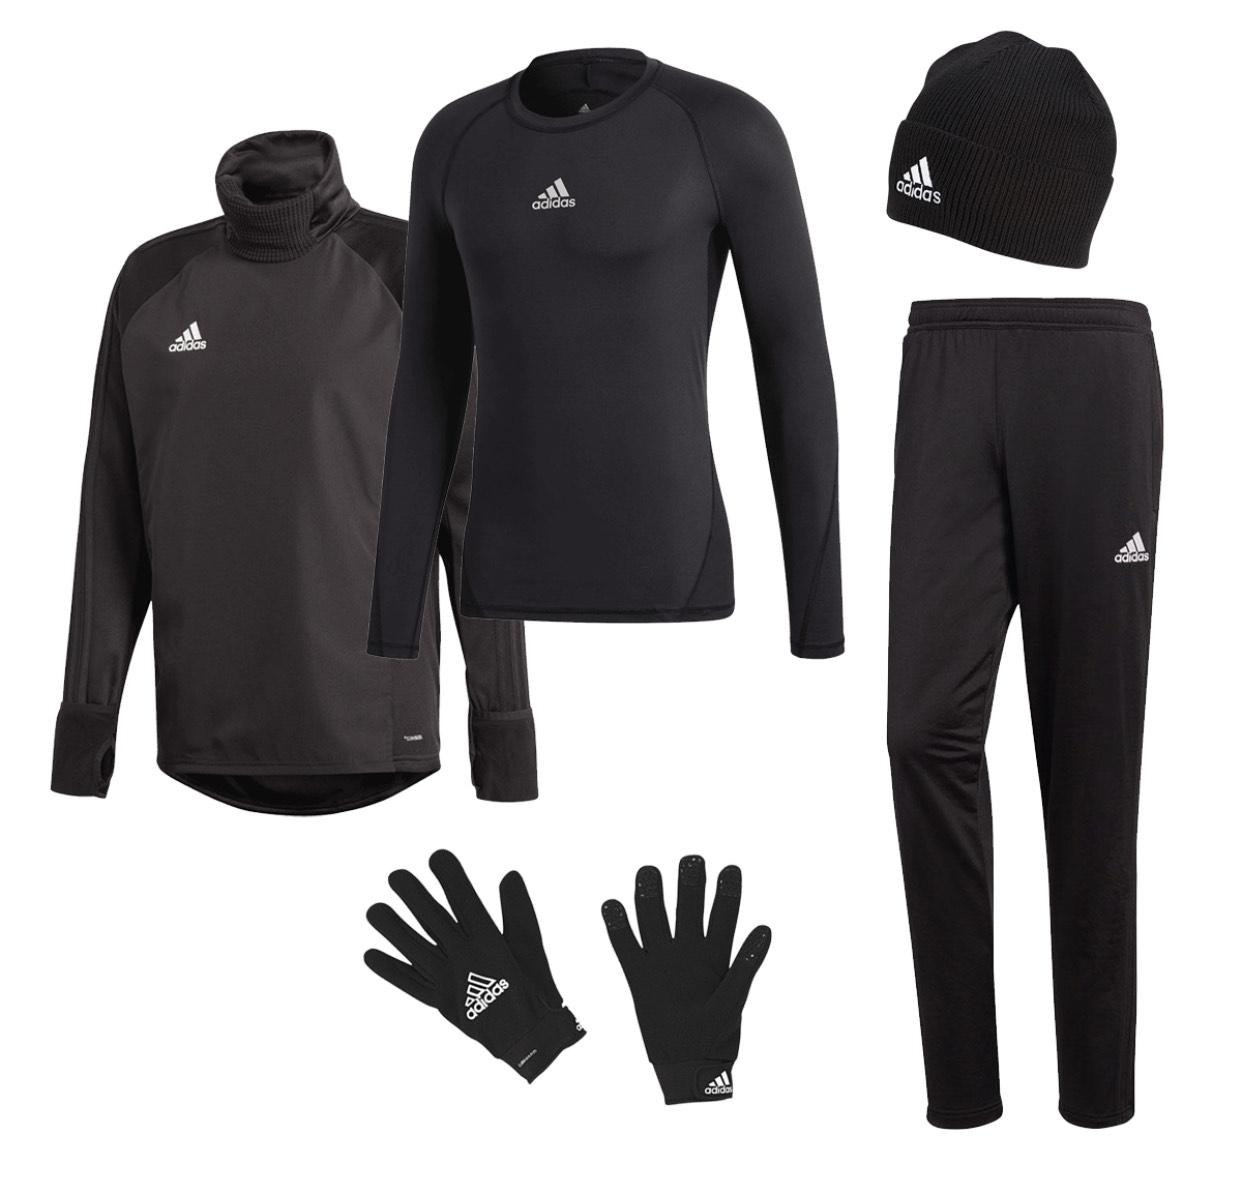 Adidas Winterset Condivo 18 5-teilig